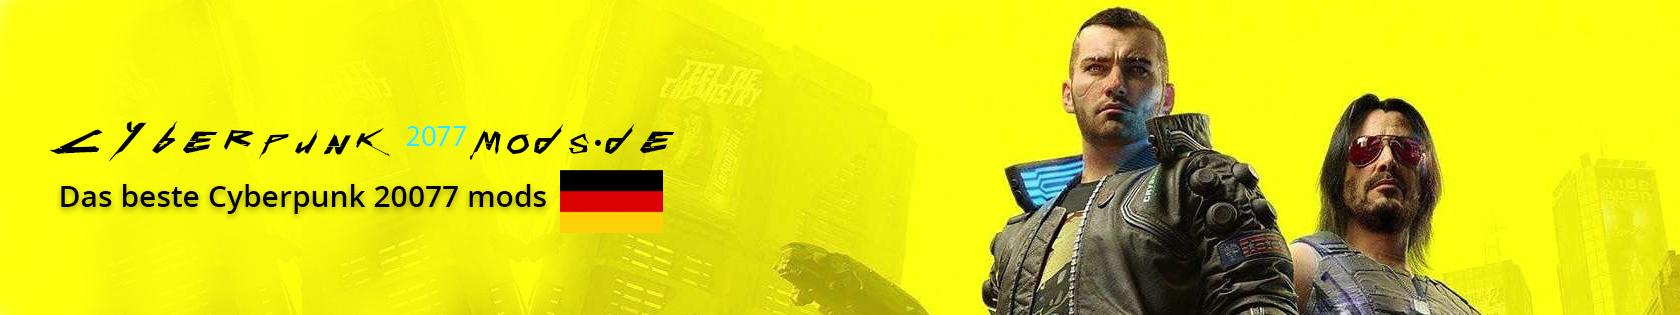 Cyberpunk 2077 mods | CP2077 Mods